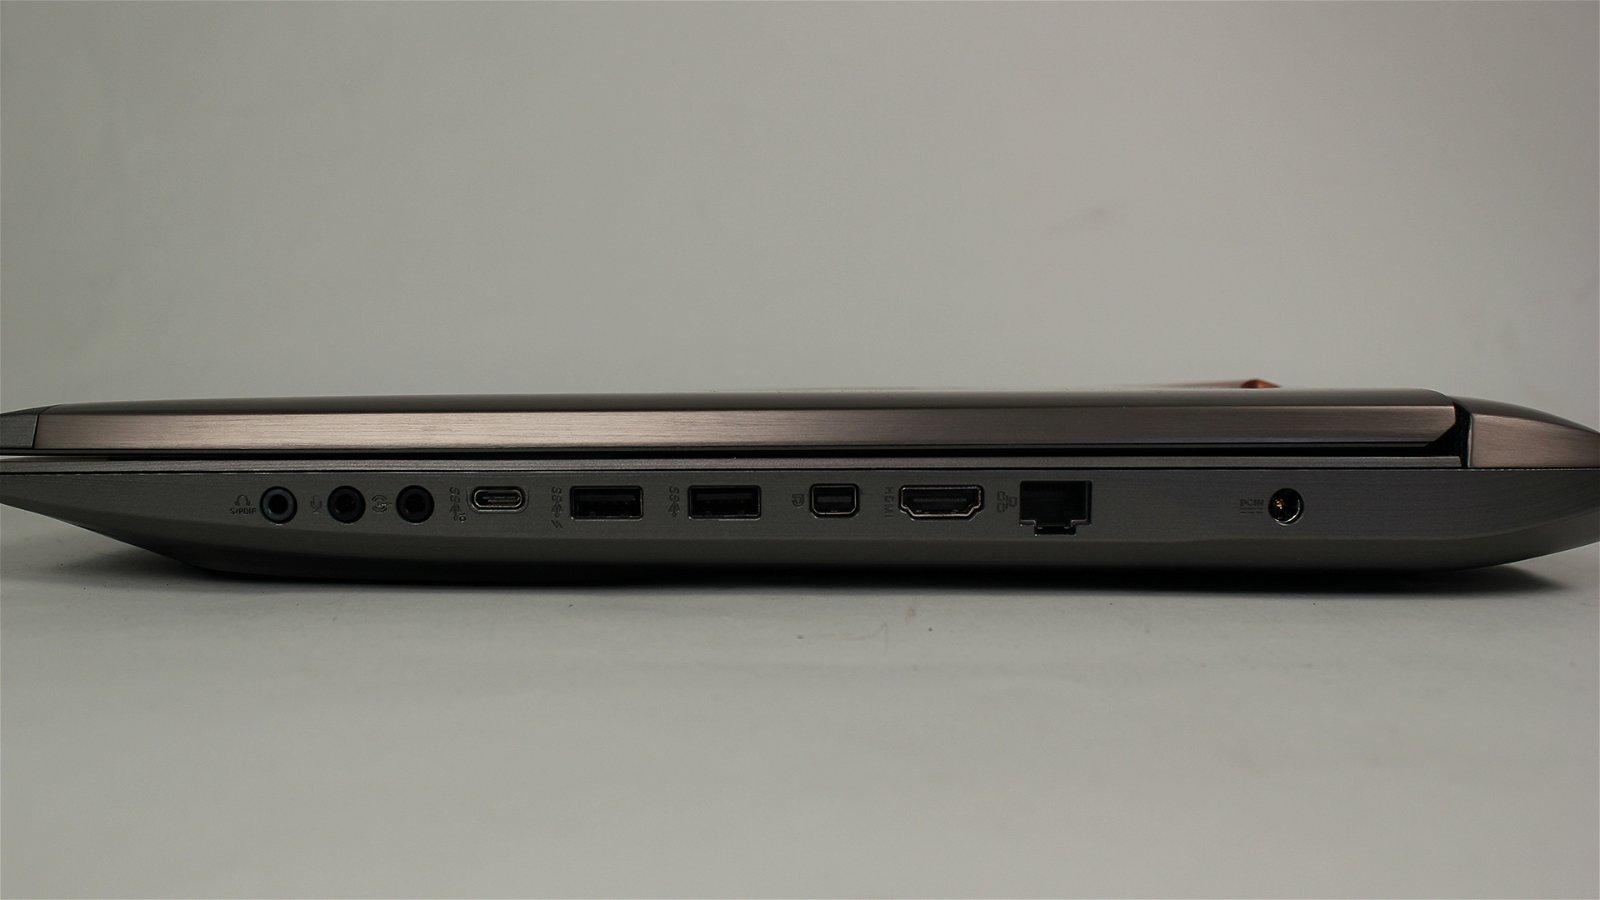 Asus Rog G752Vt-Dh72 (Laptop) Review 4